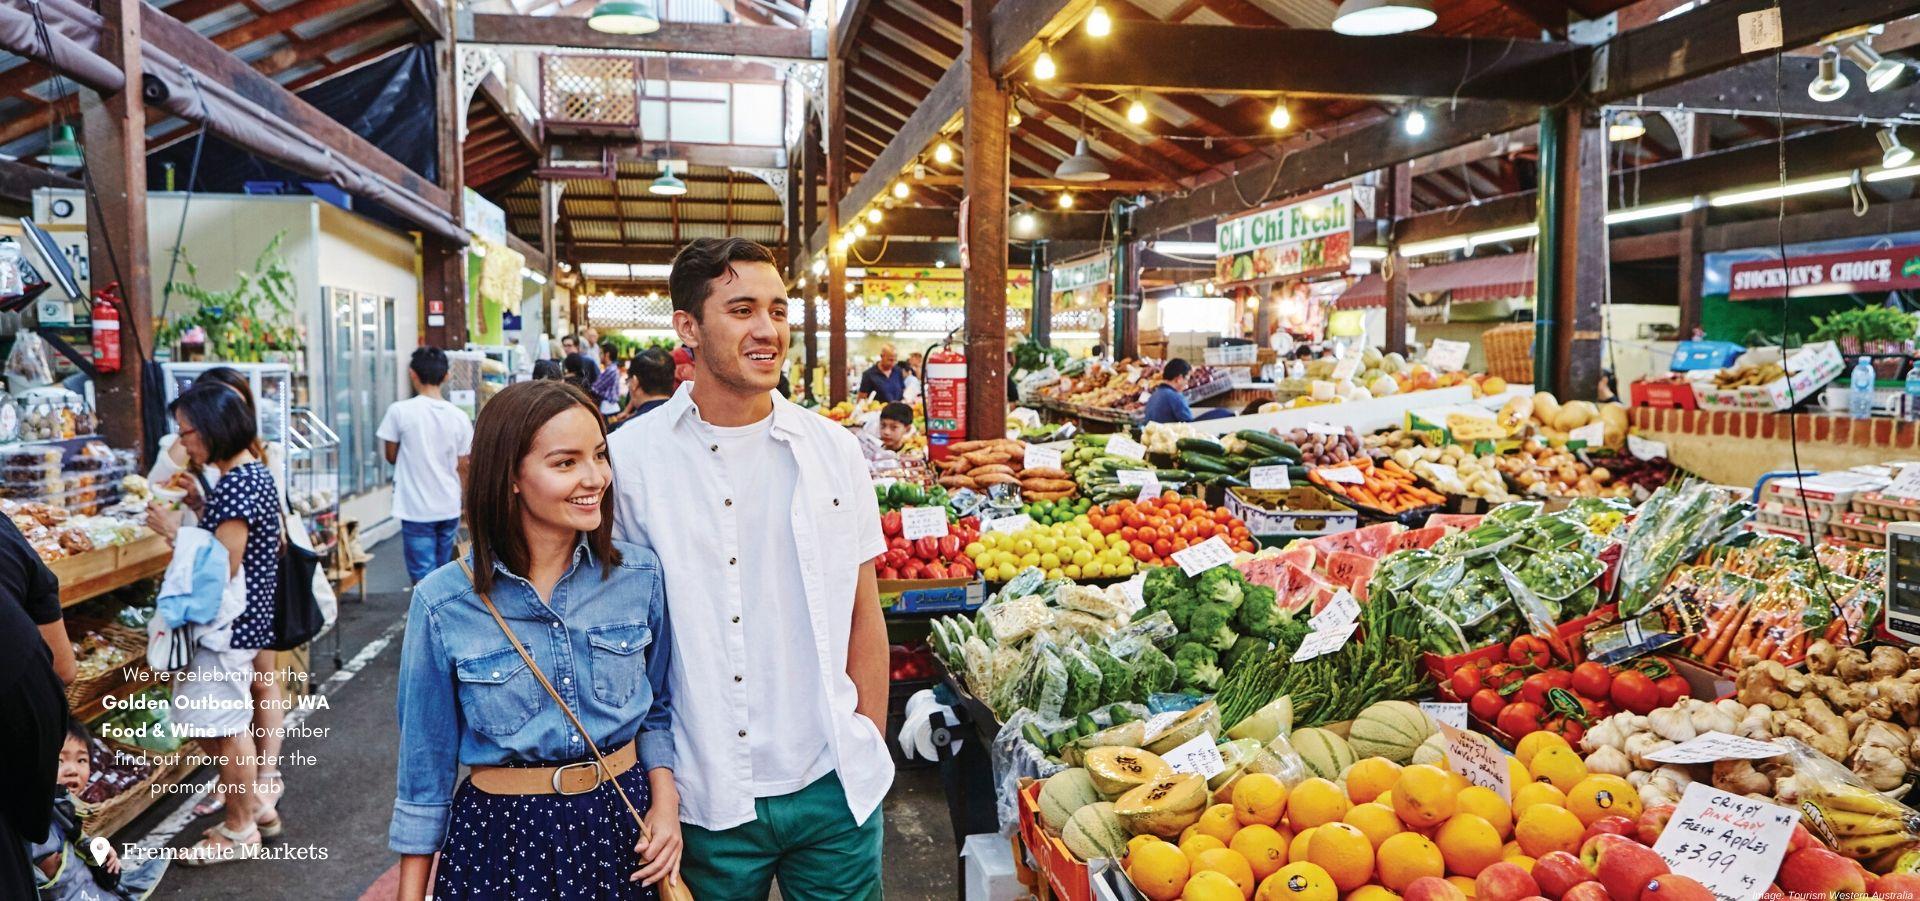 Walking through the fremantle Markets